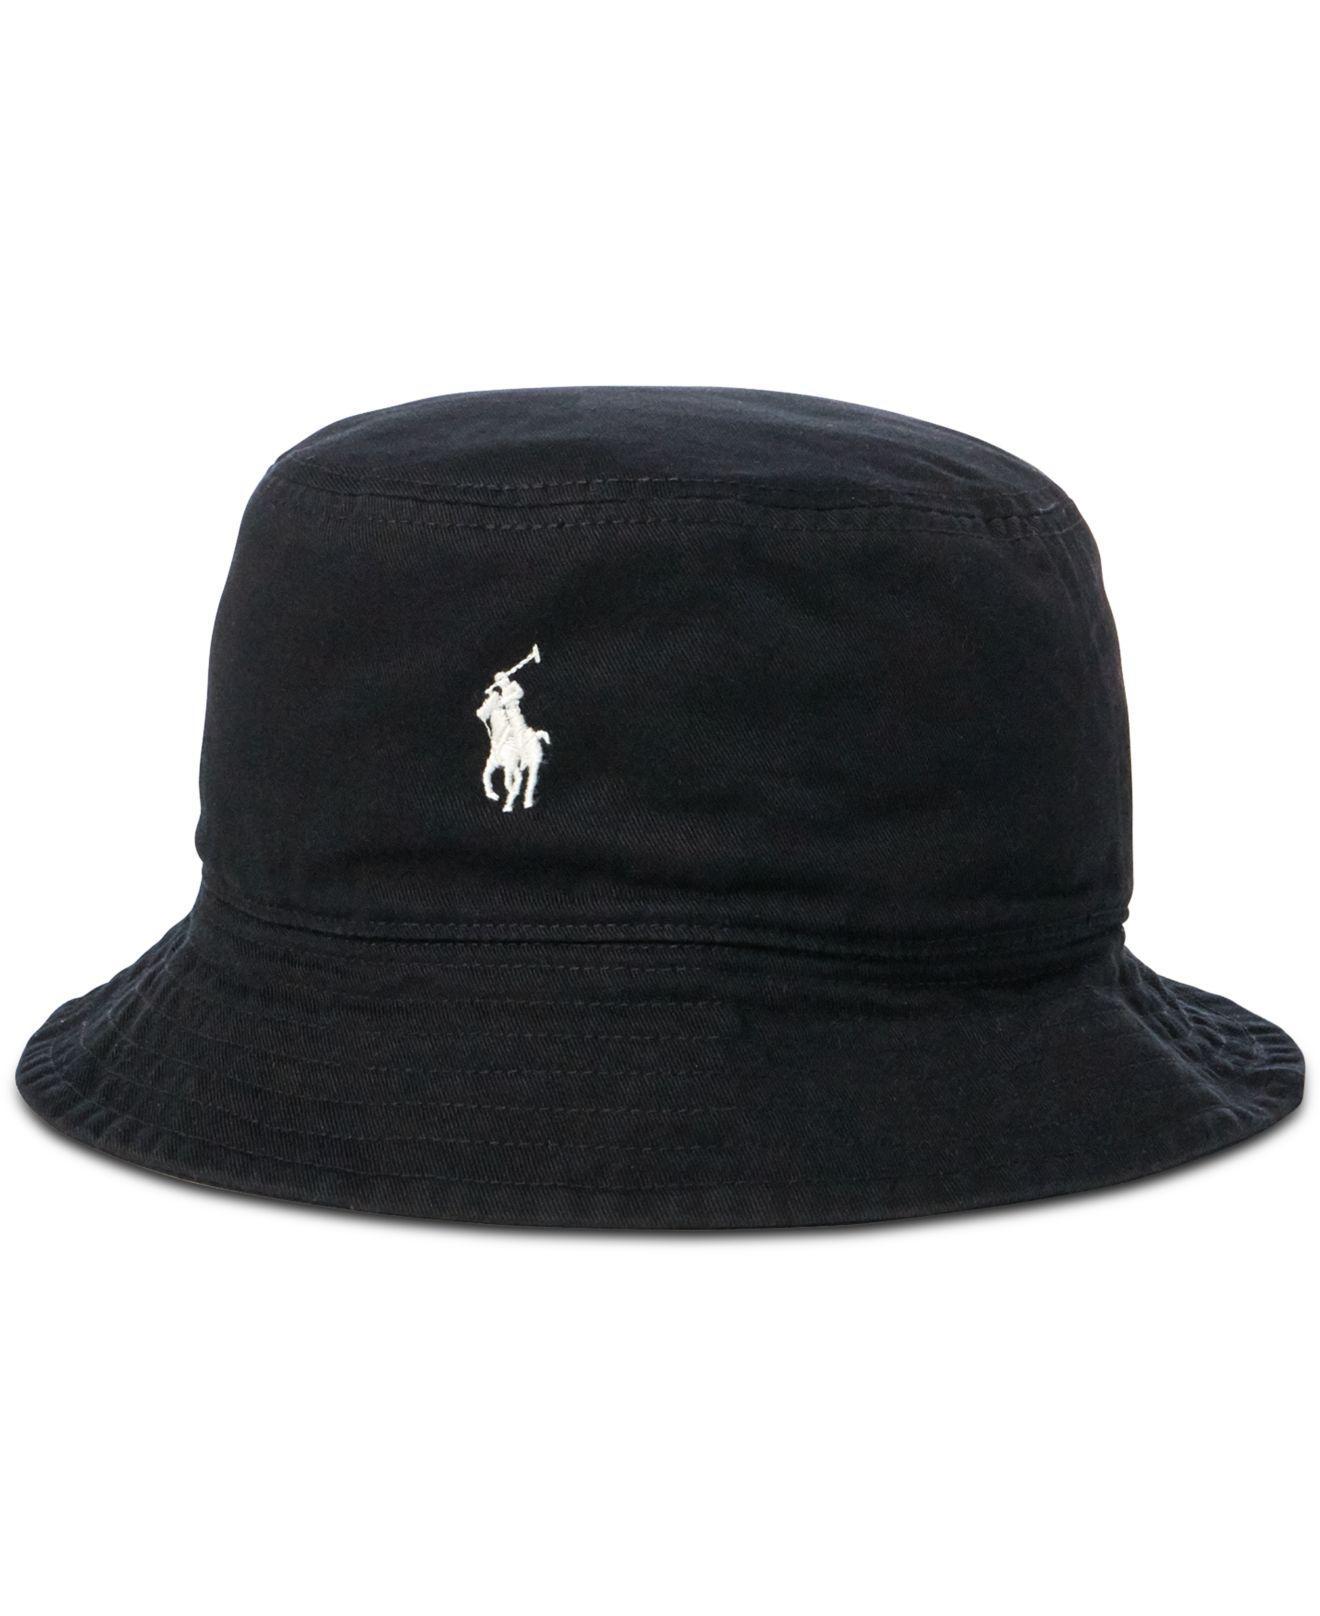 Lyst - Polo Ralph Lauren Reversible Twill Bucket Hat in Black for Men 355539f3c52